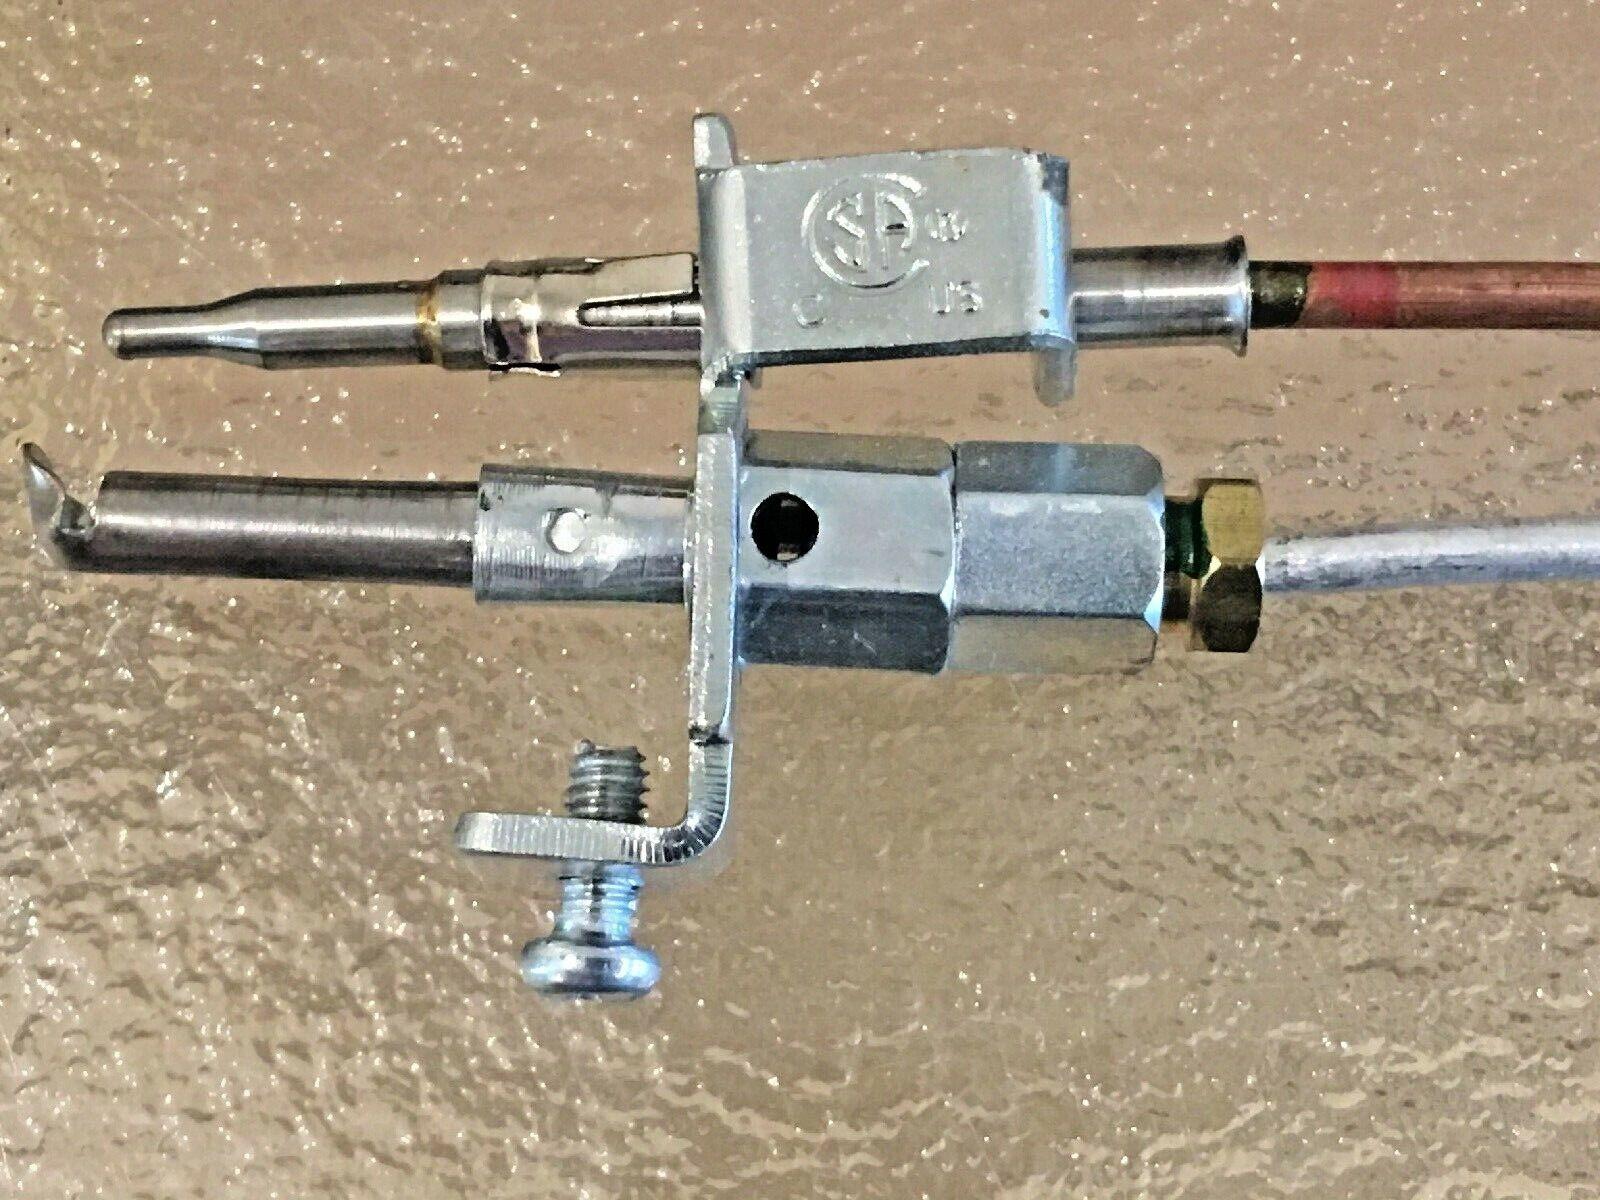 Wedgewood Atwood Stove Oven RV1733 RV2133 Thermocouple 57274 Burner Pilot Tube